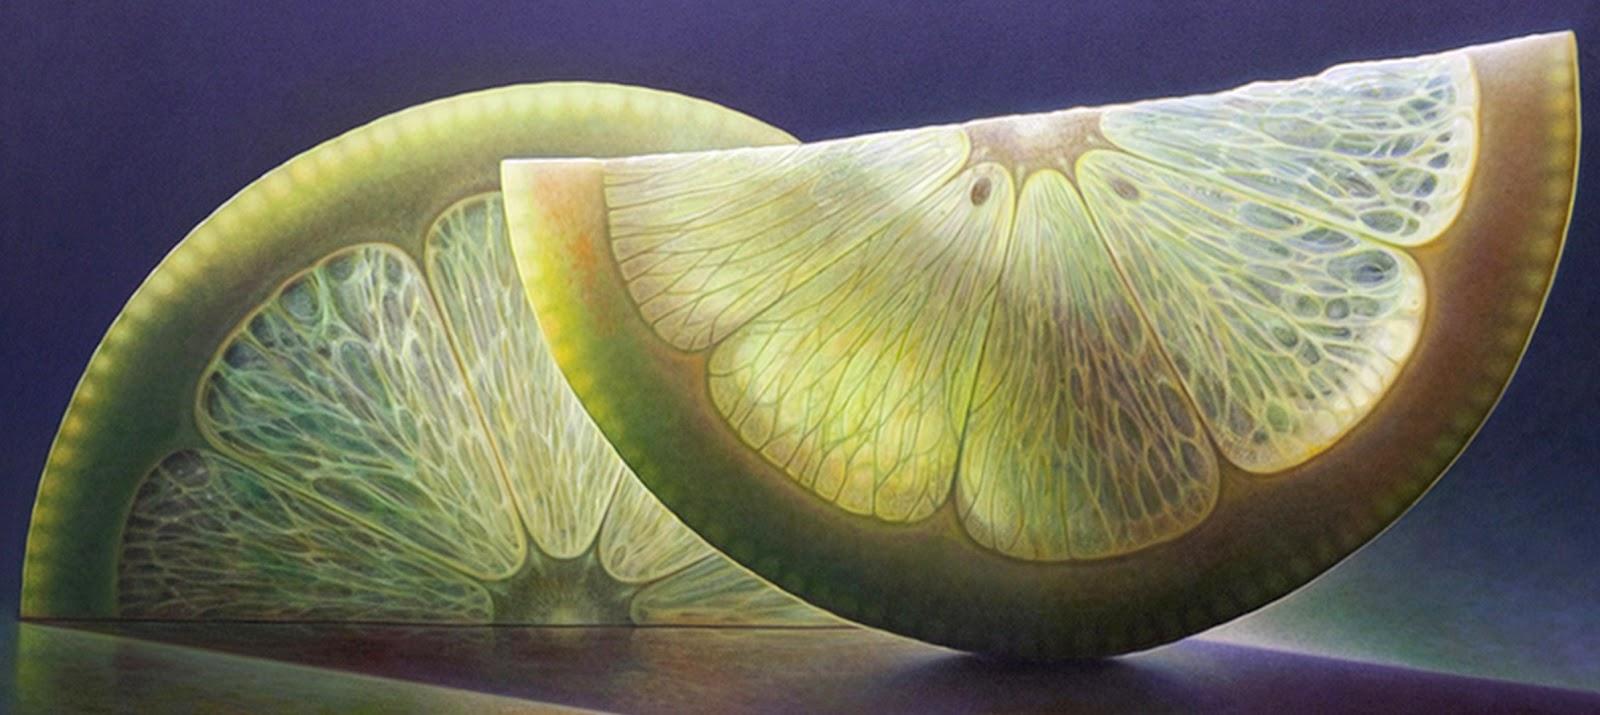 Im genes arte pinturas bodegones modernos para decorar el for Cuadros modernos para fotos